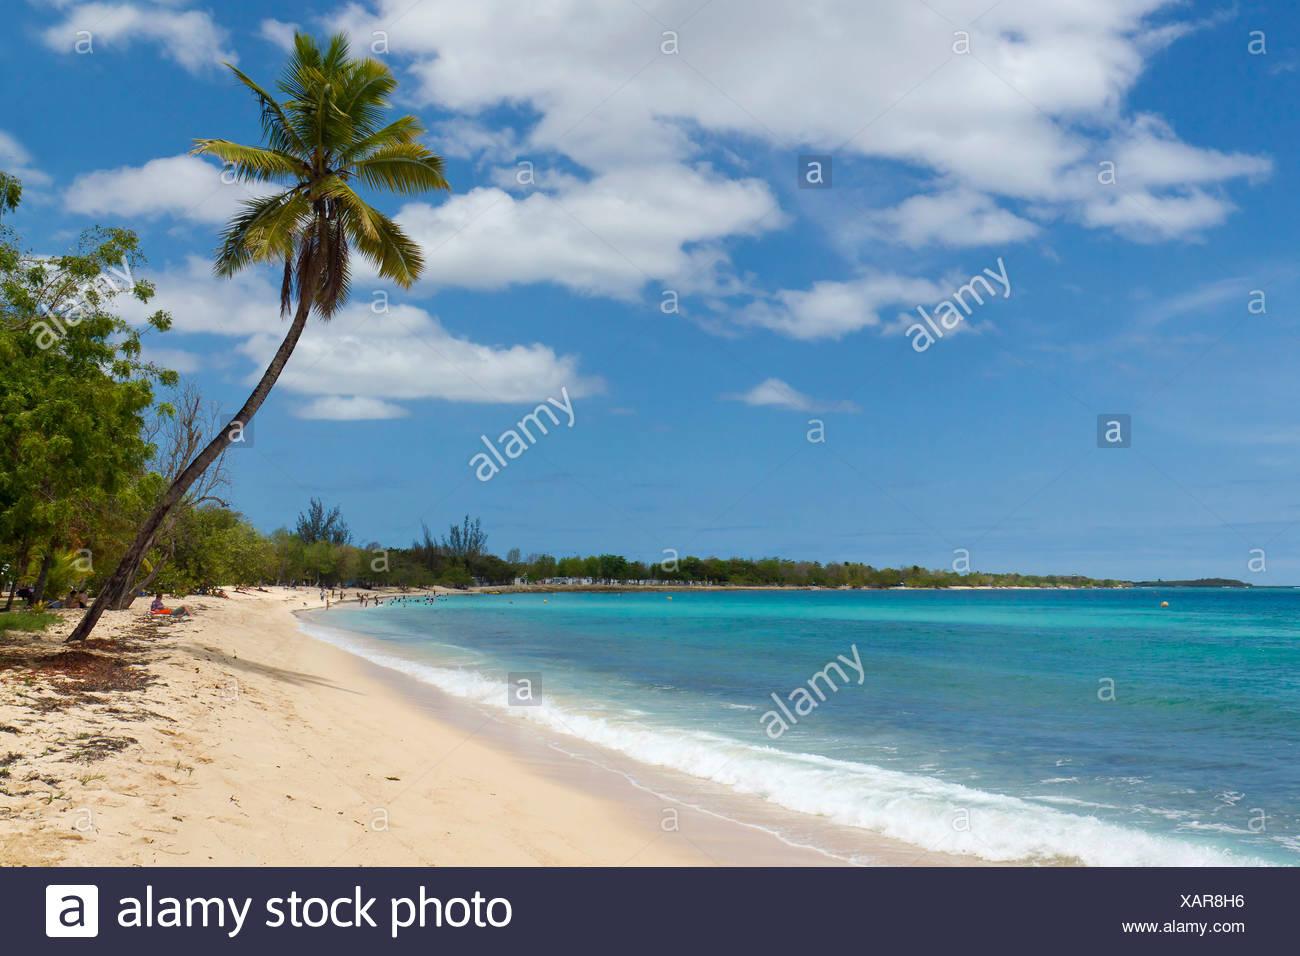 Palm tree on the Anse du Souffleur beach, Port-Louis, Grande-Terre, Guadeloupe island, French Antilles, Lesser Antilles Stock Photo